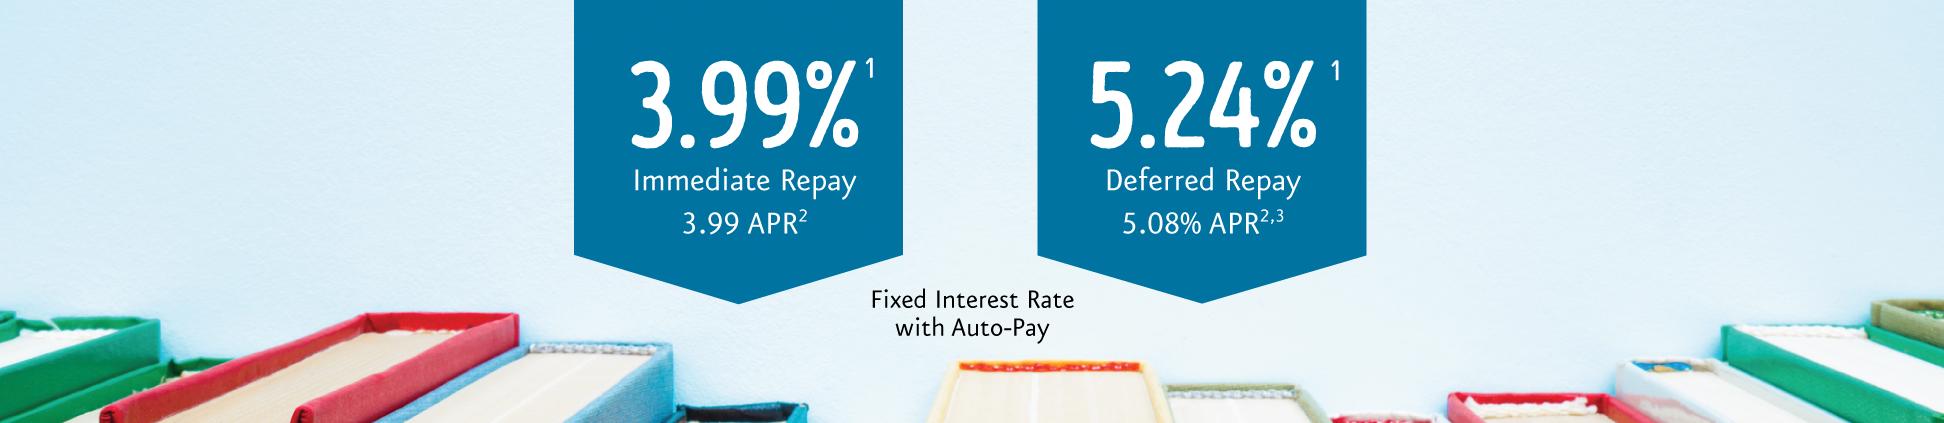 RISLA-Loans-Undergrad-Rates-FINAL